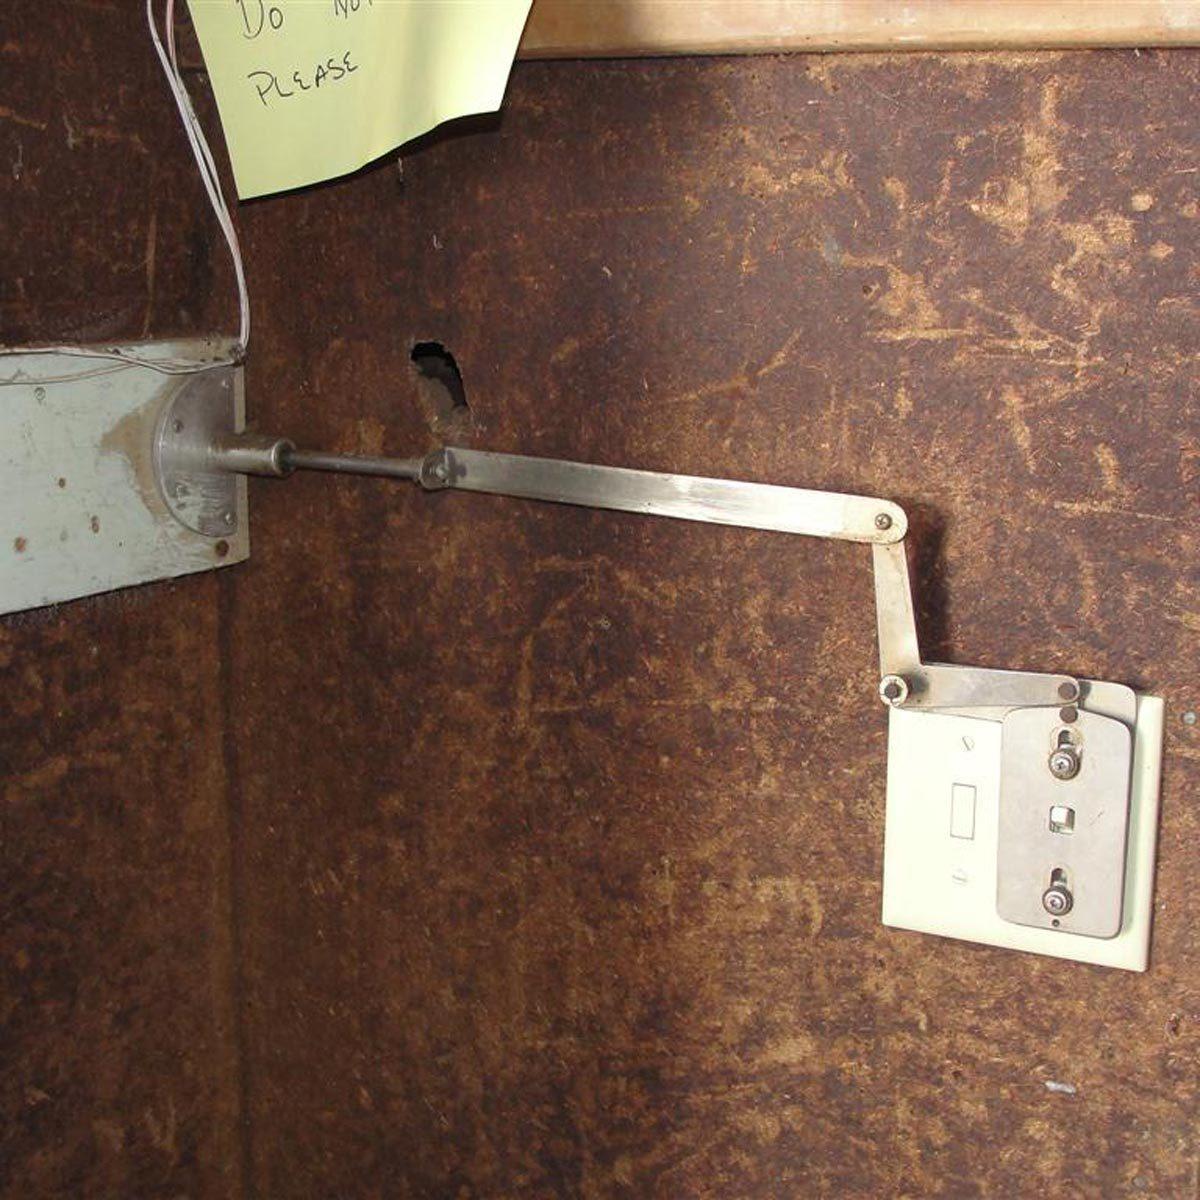 Dr. Frankenstein's wall switch